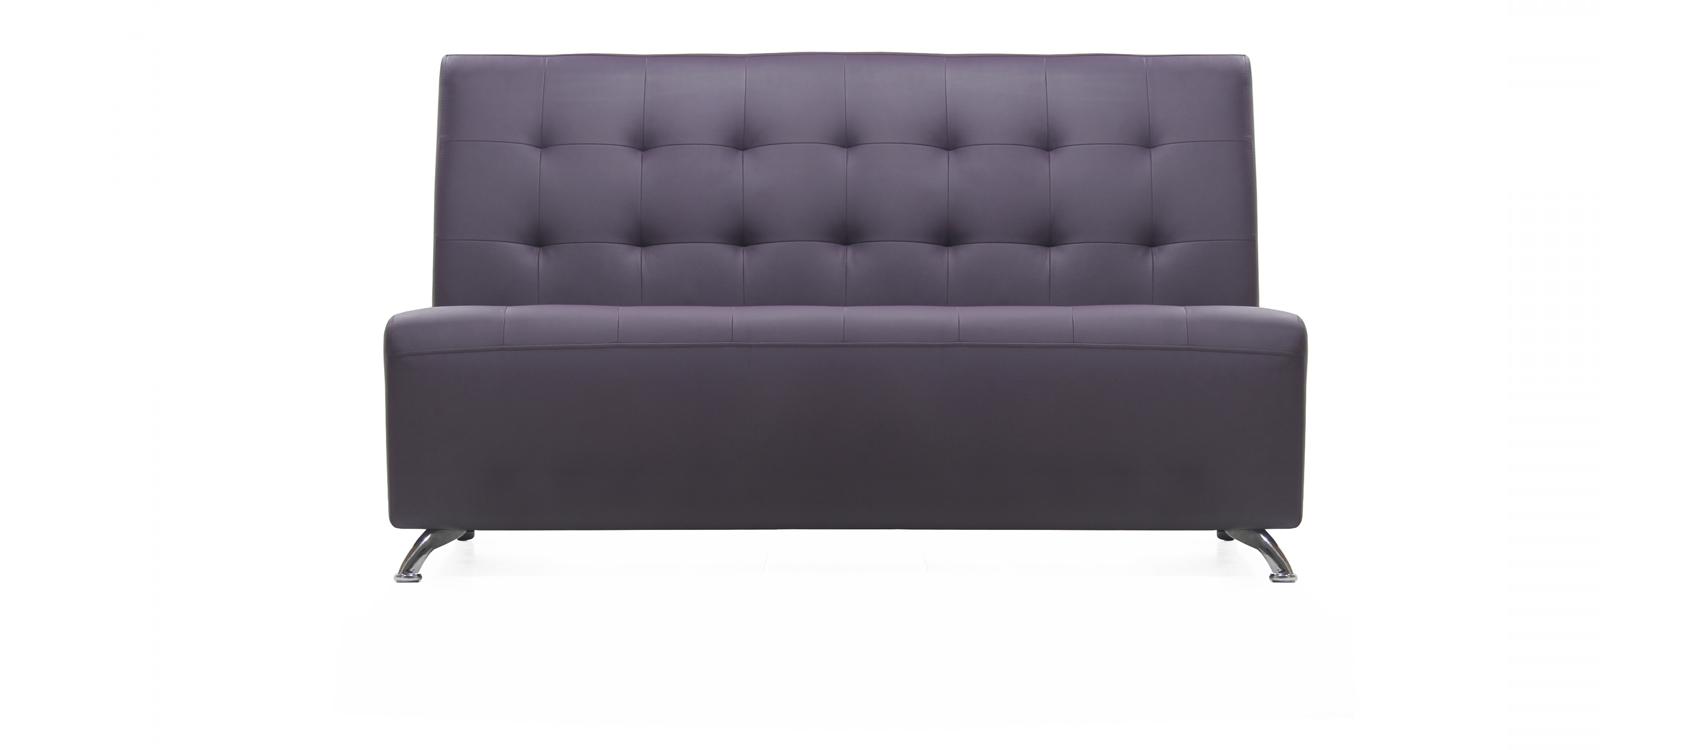 Sofa TOWN foto 1